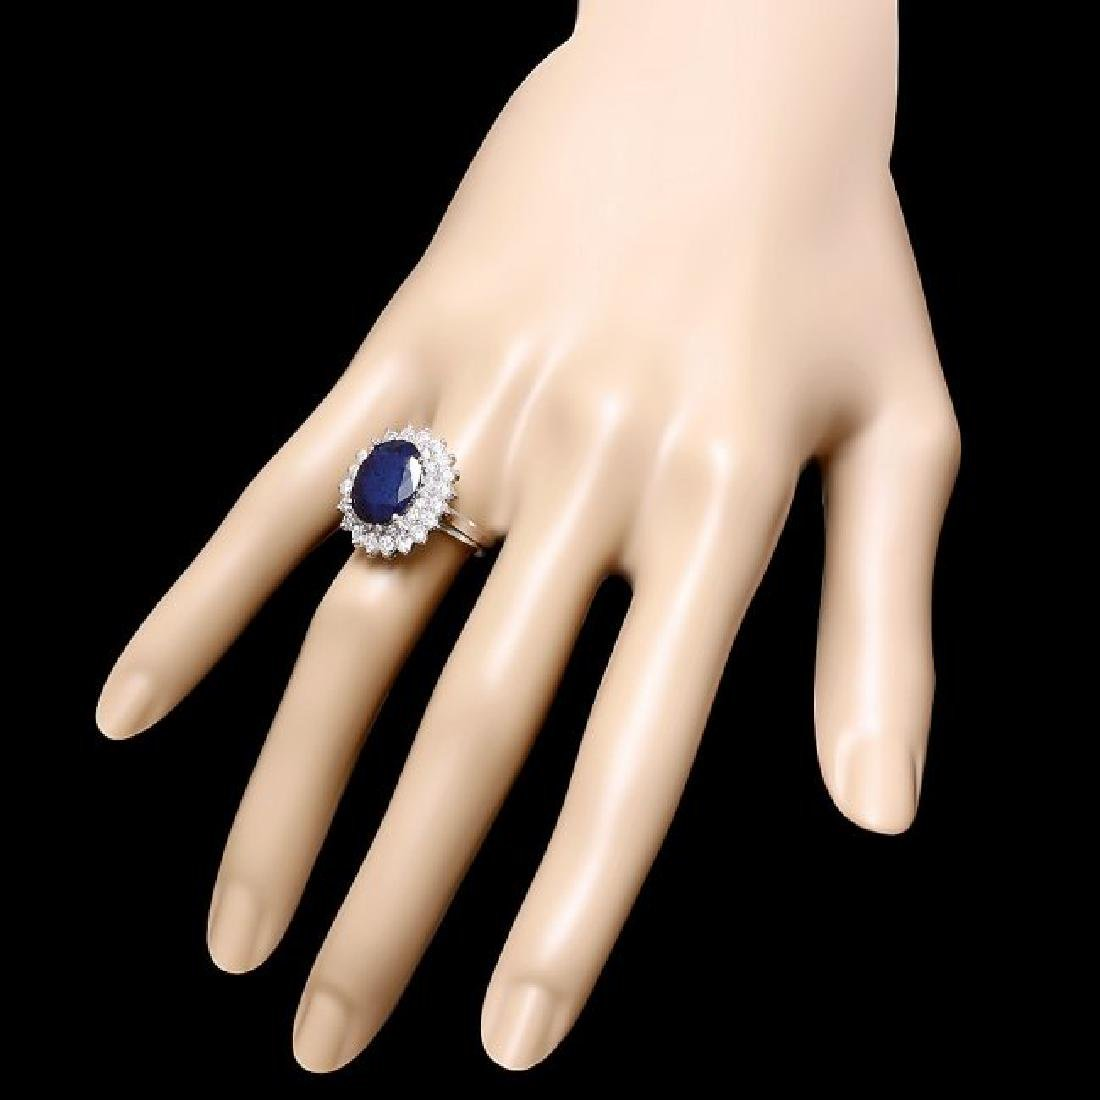 14k Gold 4.50ct Sapphire 1.45ct Diamond Ring - 3